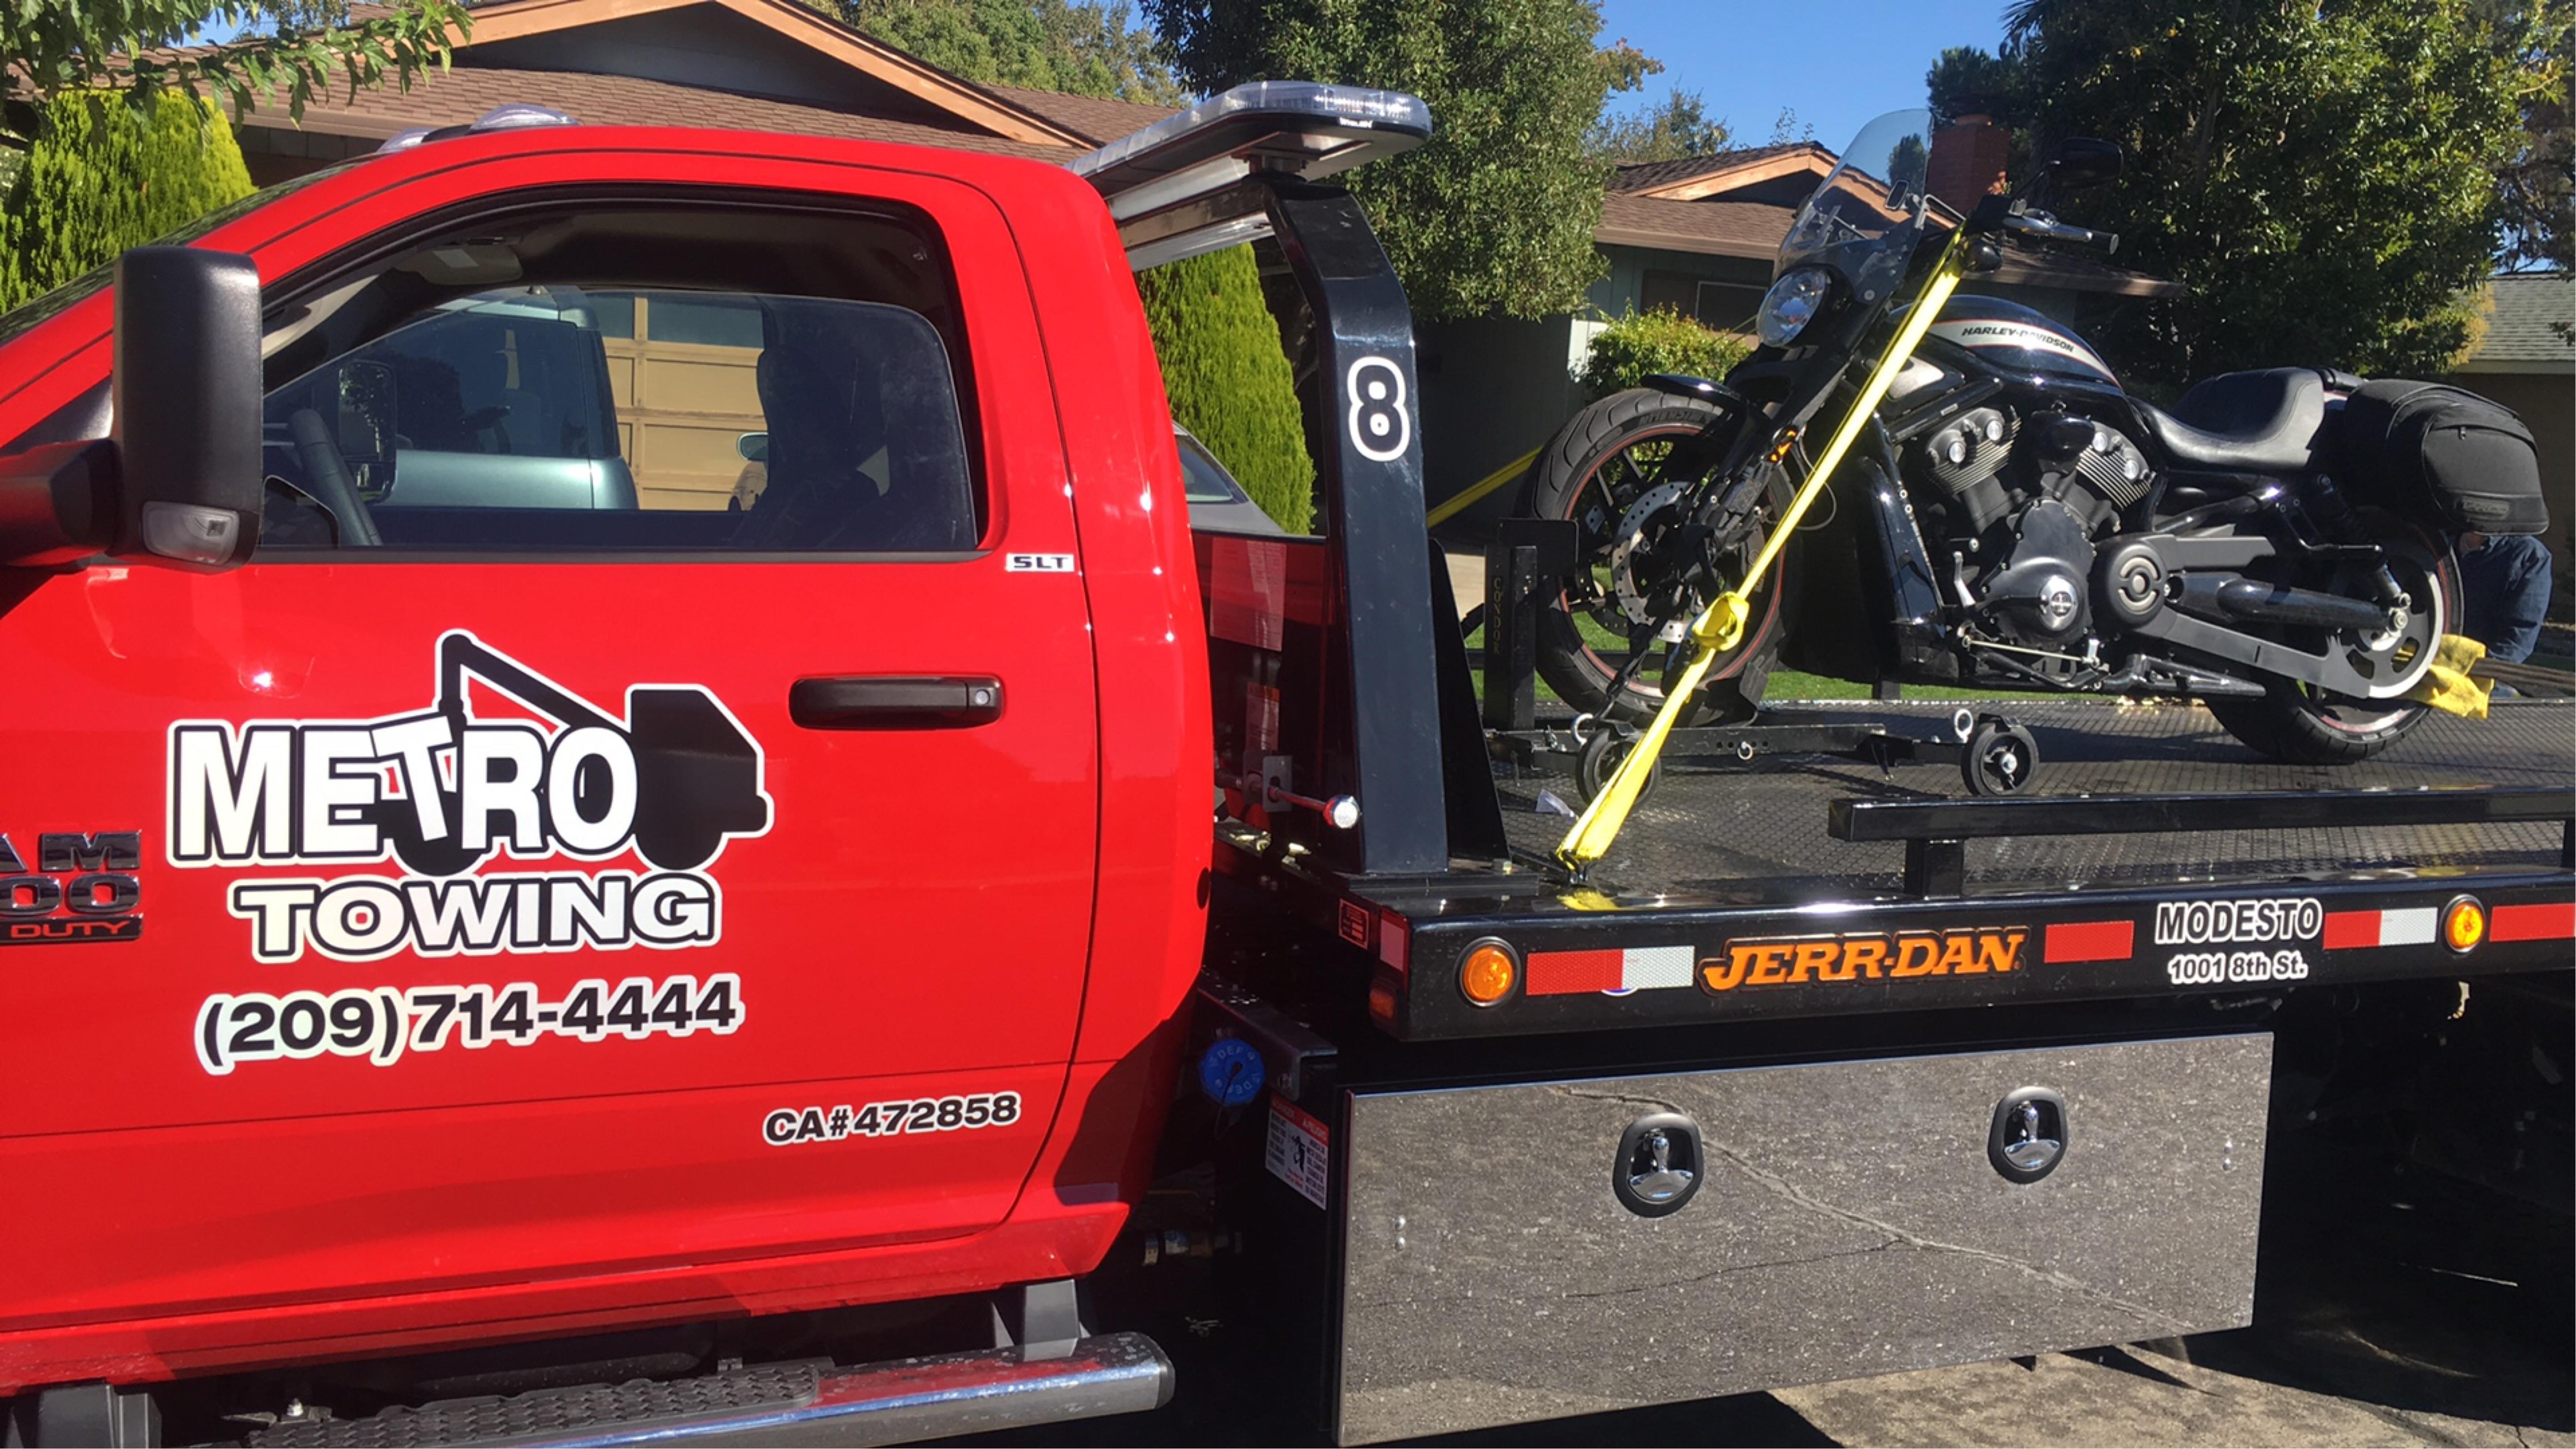 Tire Repair Near Me Open Sunday >> Metro Towing, Tracy California (CA) - LocalDatabase.com